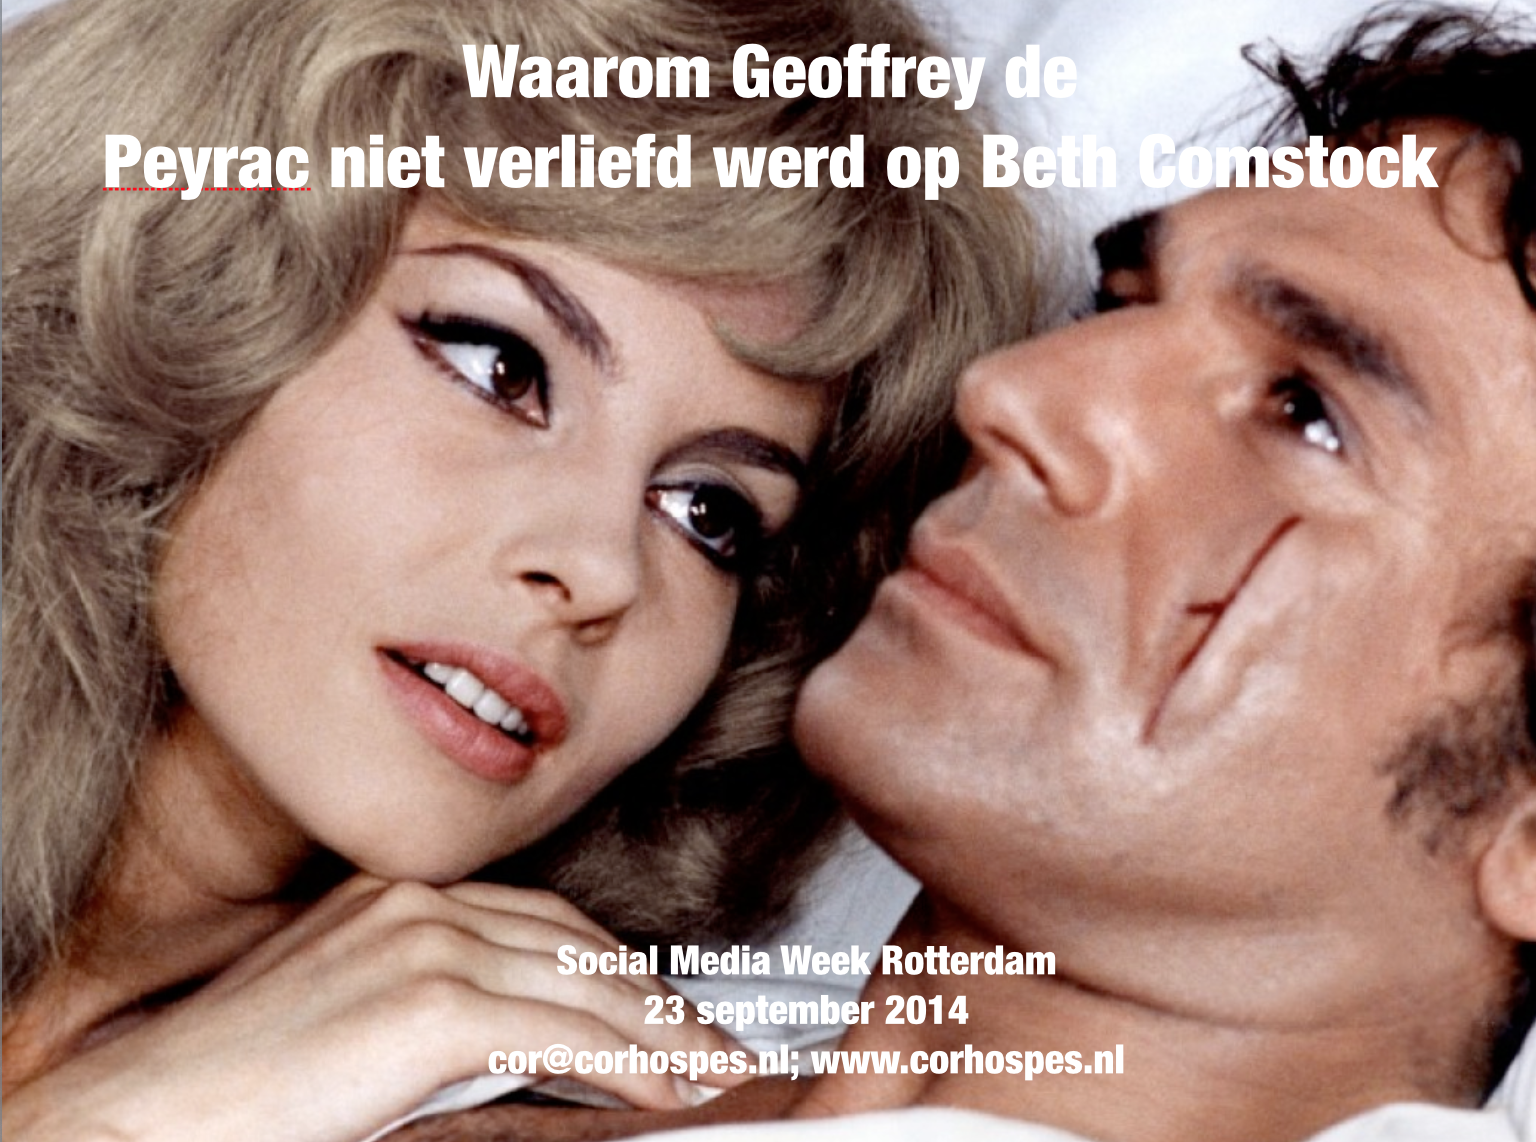 Titel lezing volgende week dinsdag @SMWRotterdam. Ben jij er ook? http://t.co/C01g0lOSTV